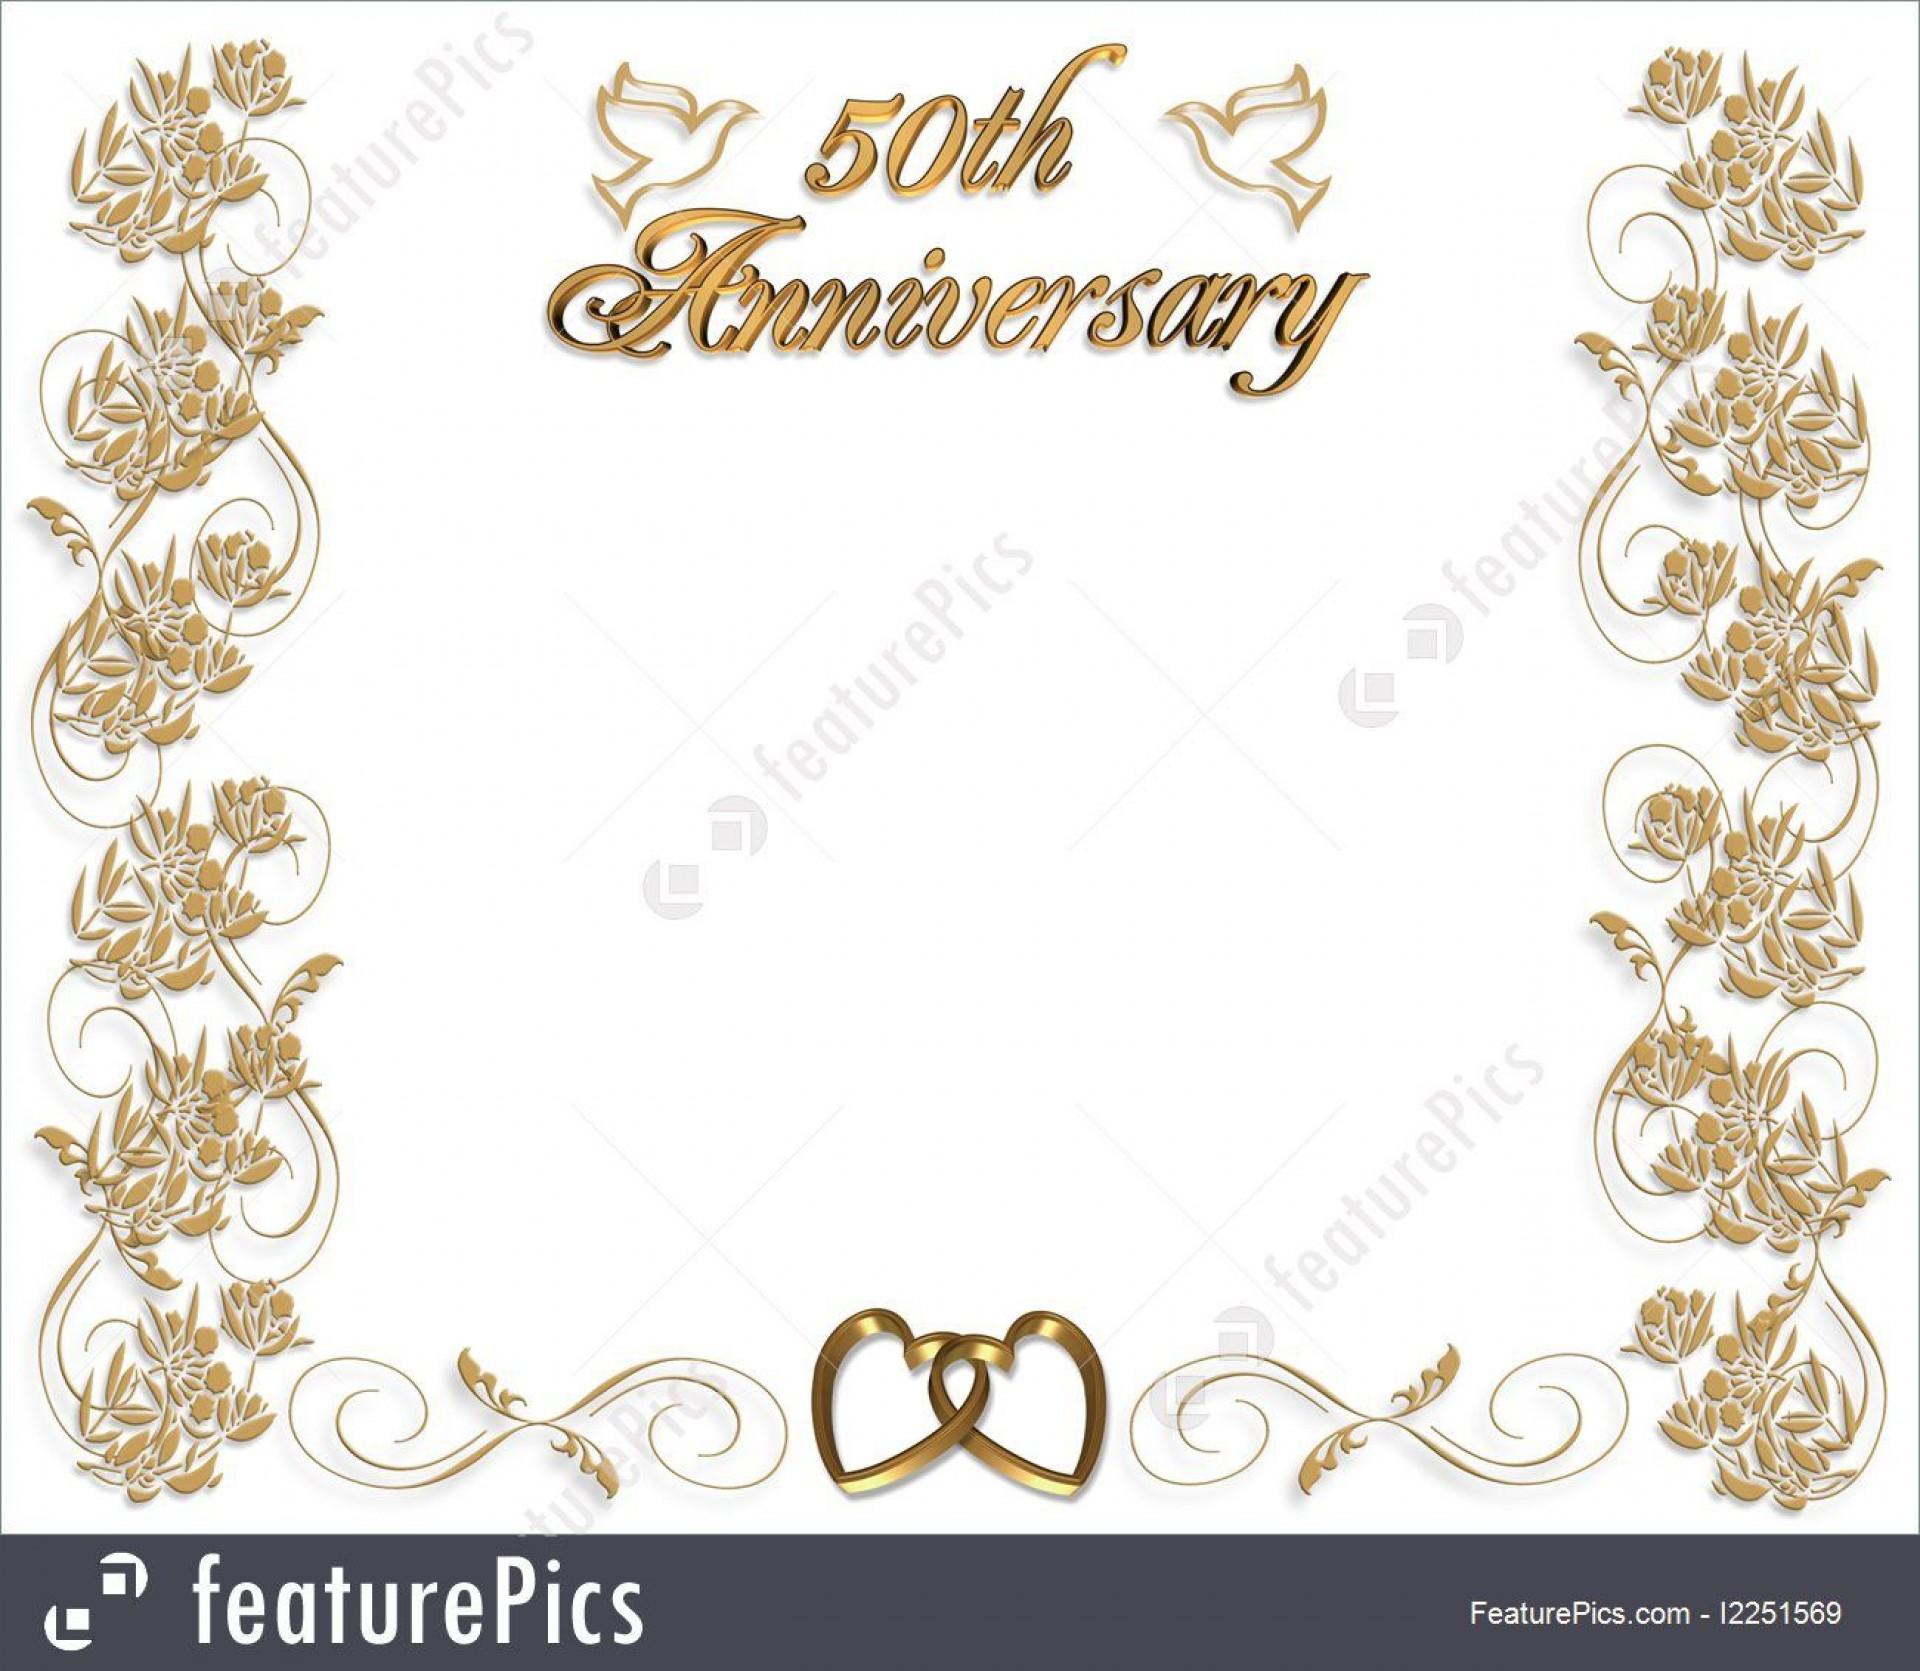 009 Fantastic 50th Wedding Anniversary Invitation Template Concept  Templates Card Sample Golden1920